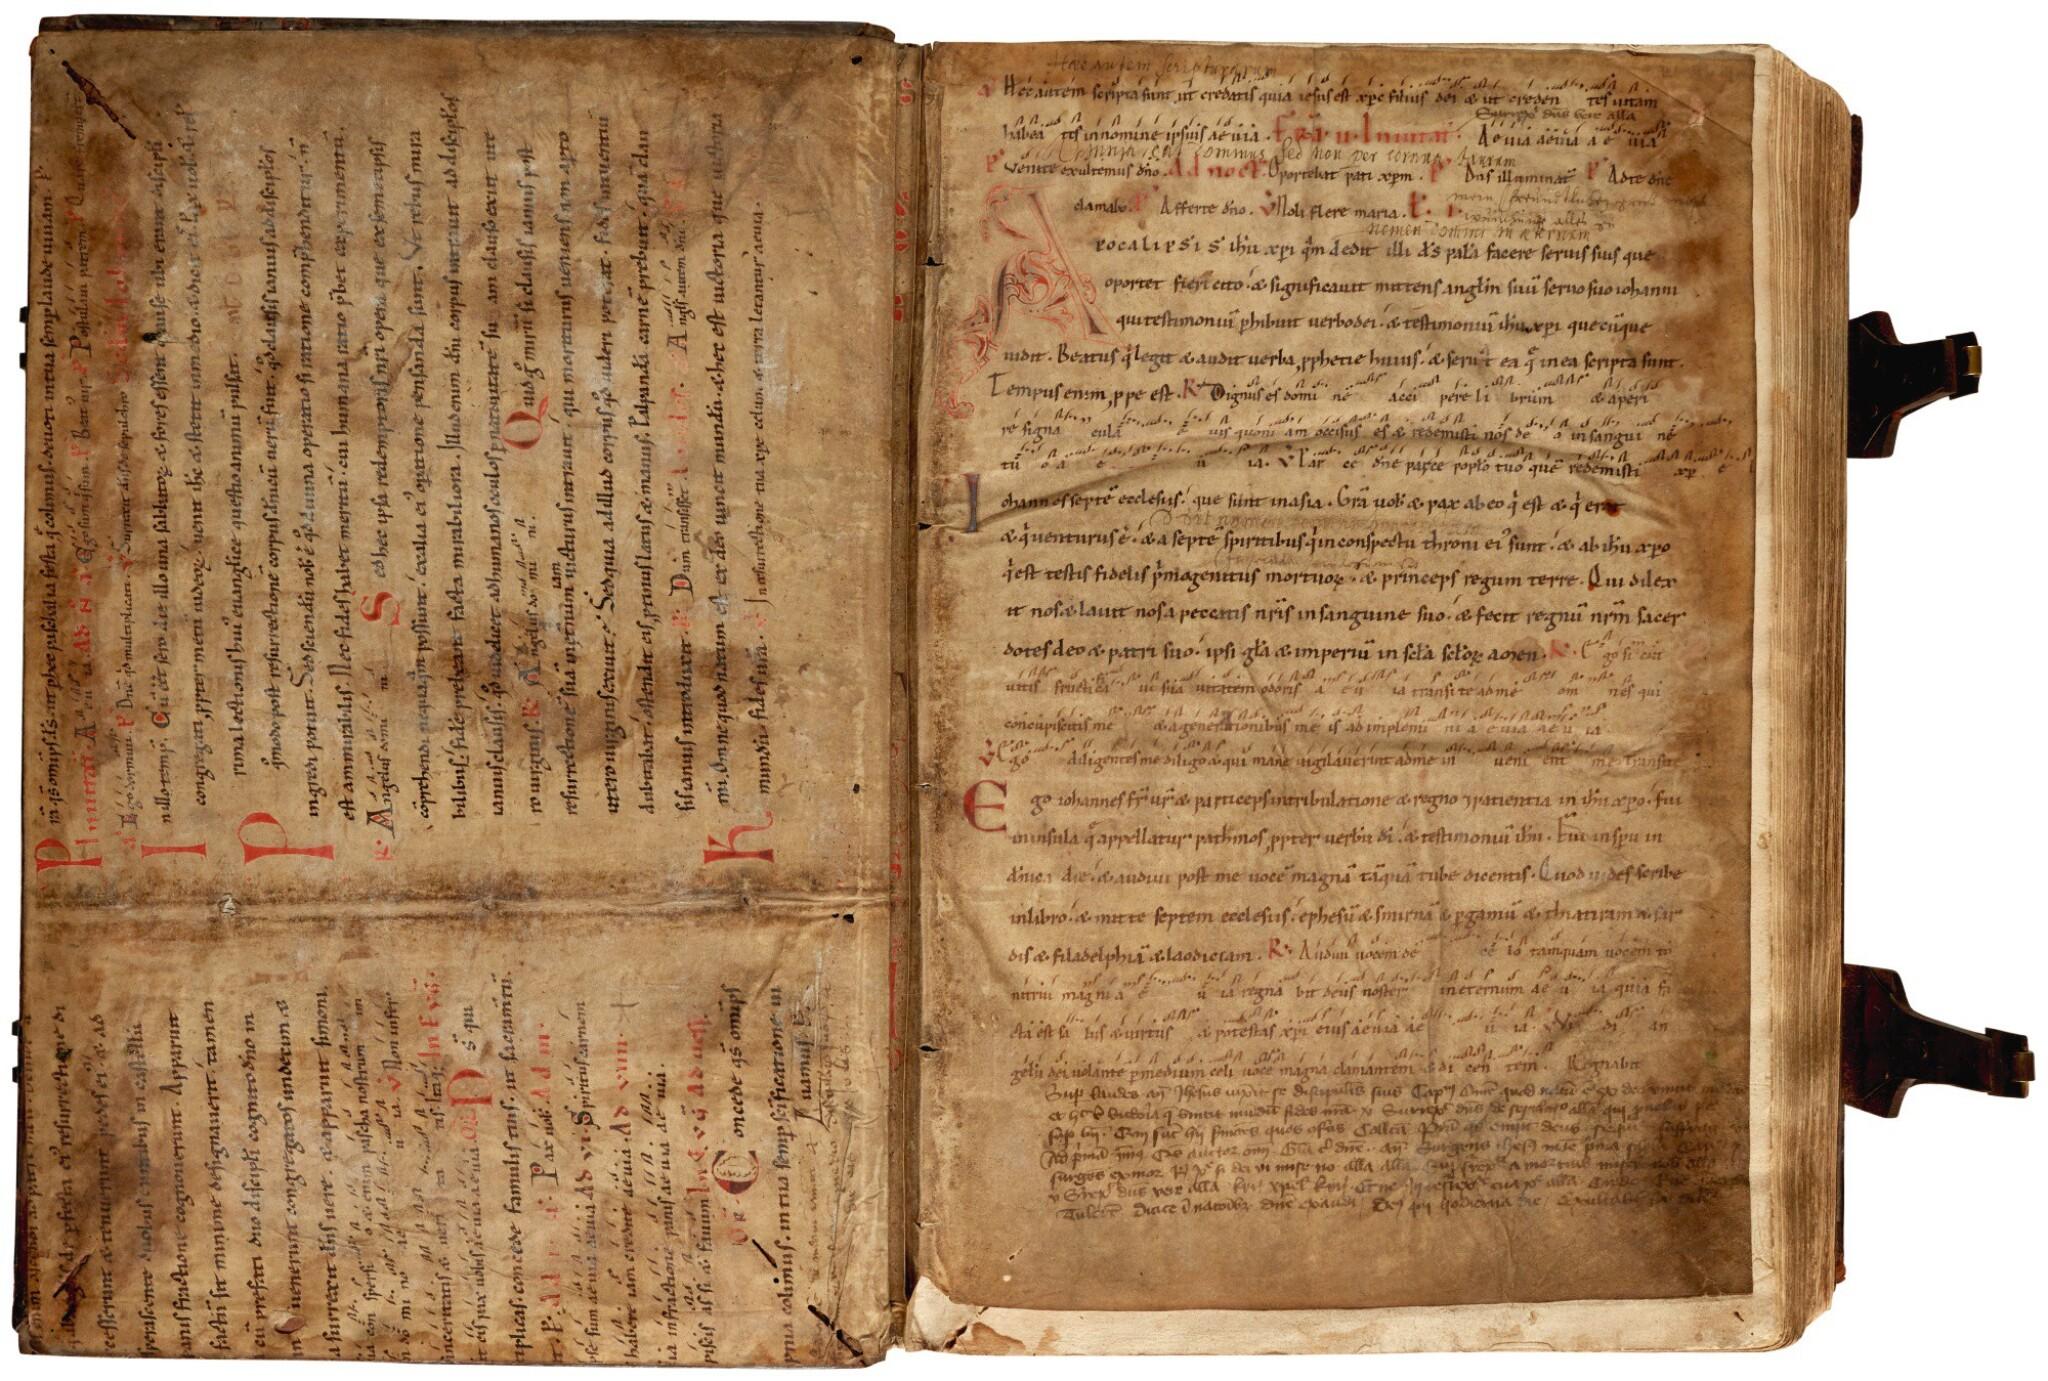 View full screen - View 1 of Lot 236. Pelbartus de Themeswar, Sermones pomerii de sanctis, Lyon, 1514, contemporary stamped calf.